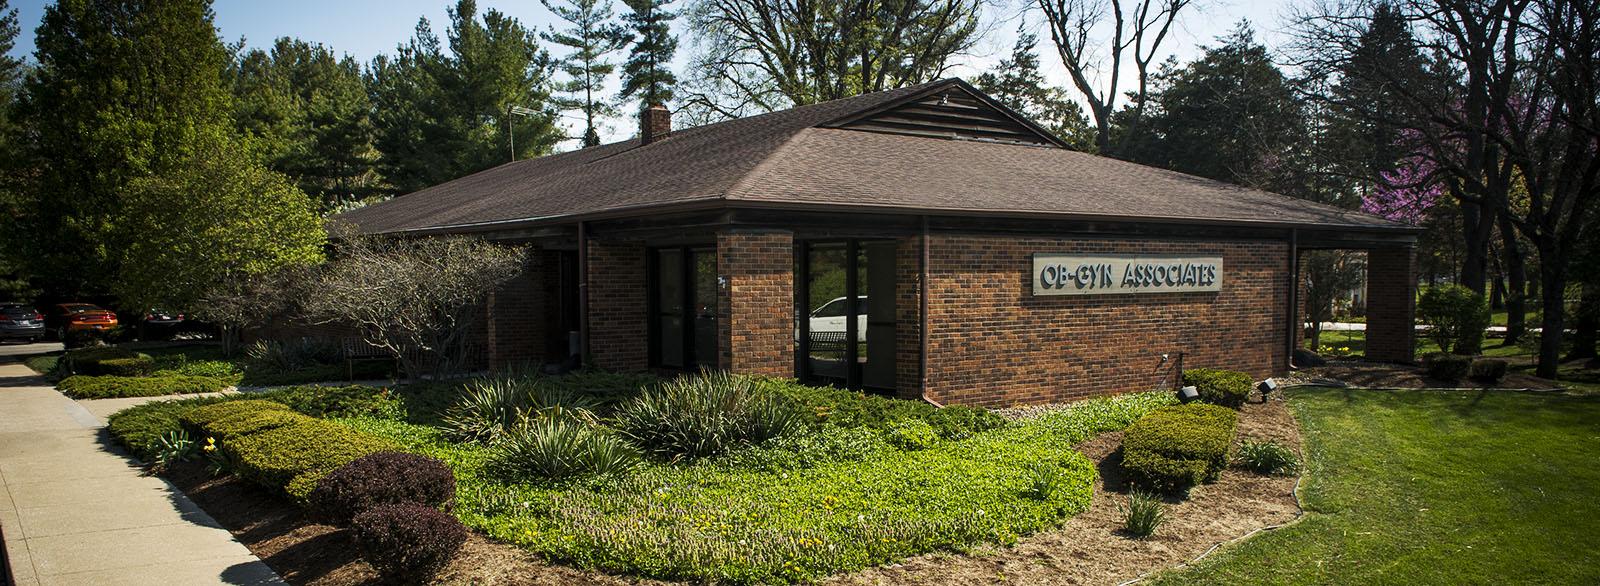 OB-GYN Associates of Columbus exterior